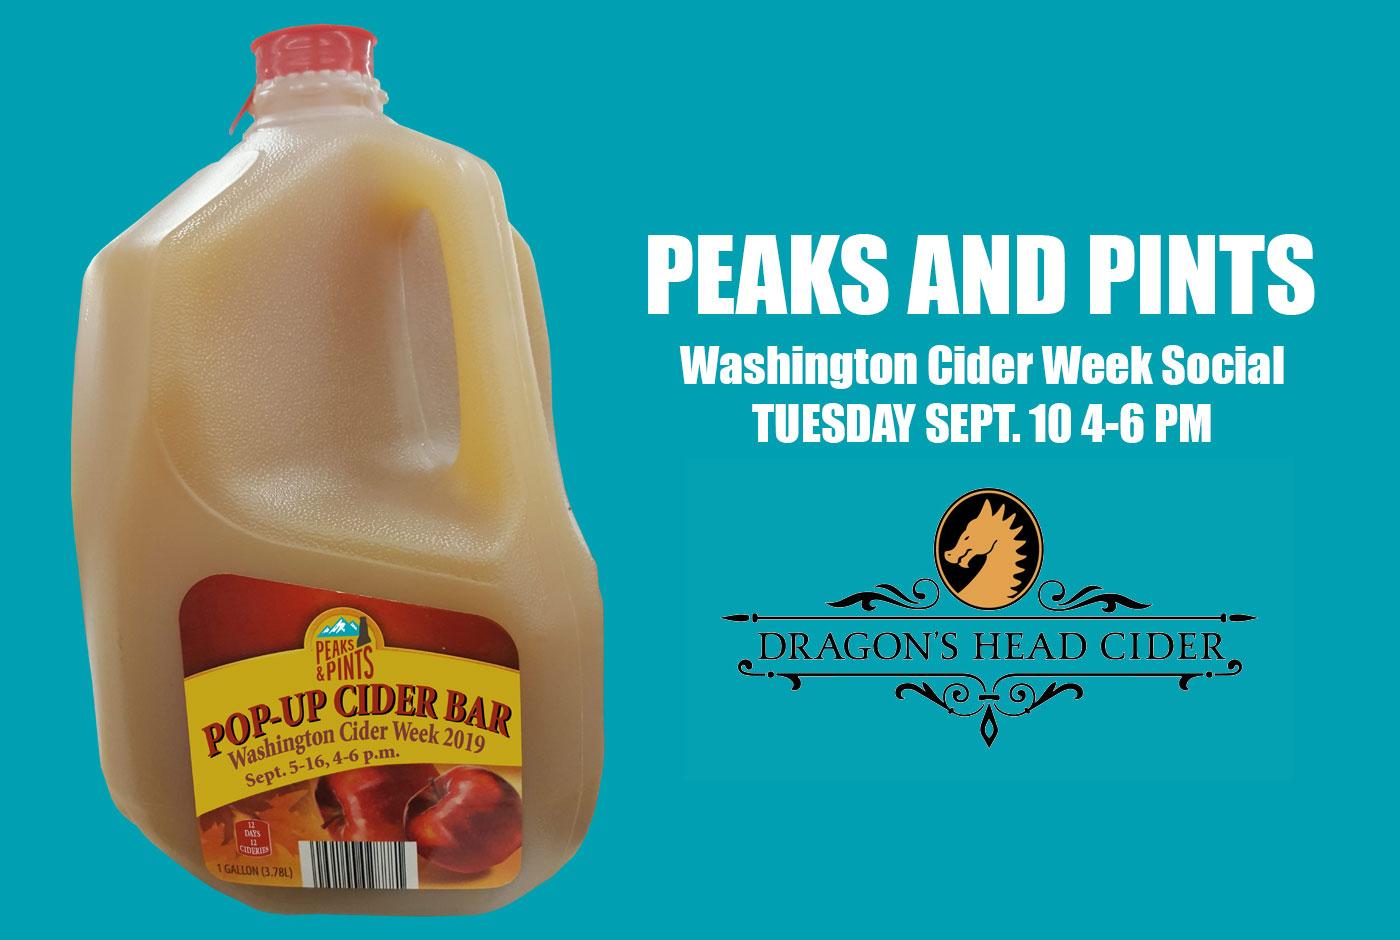 Peaks-and-Pints-Washington-Cider-Week-Social-Dragons-Head-Calendar